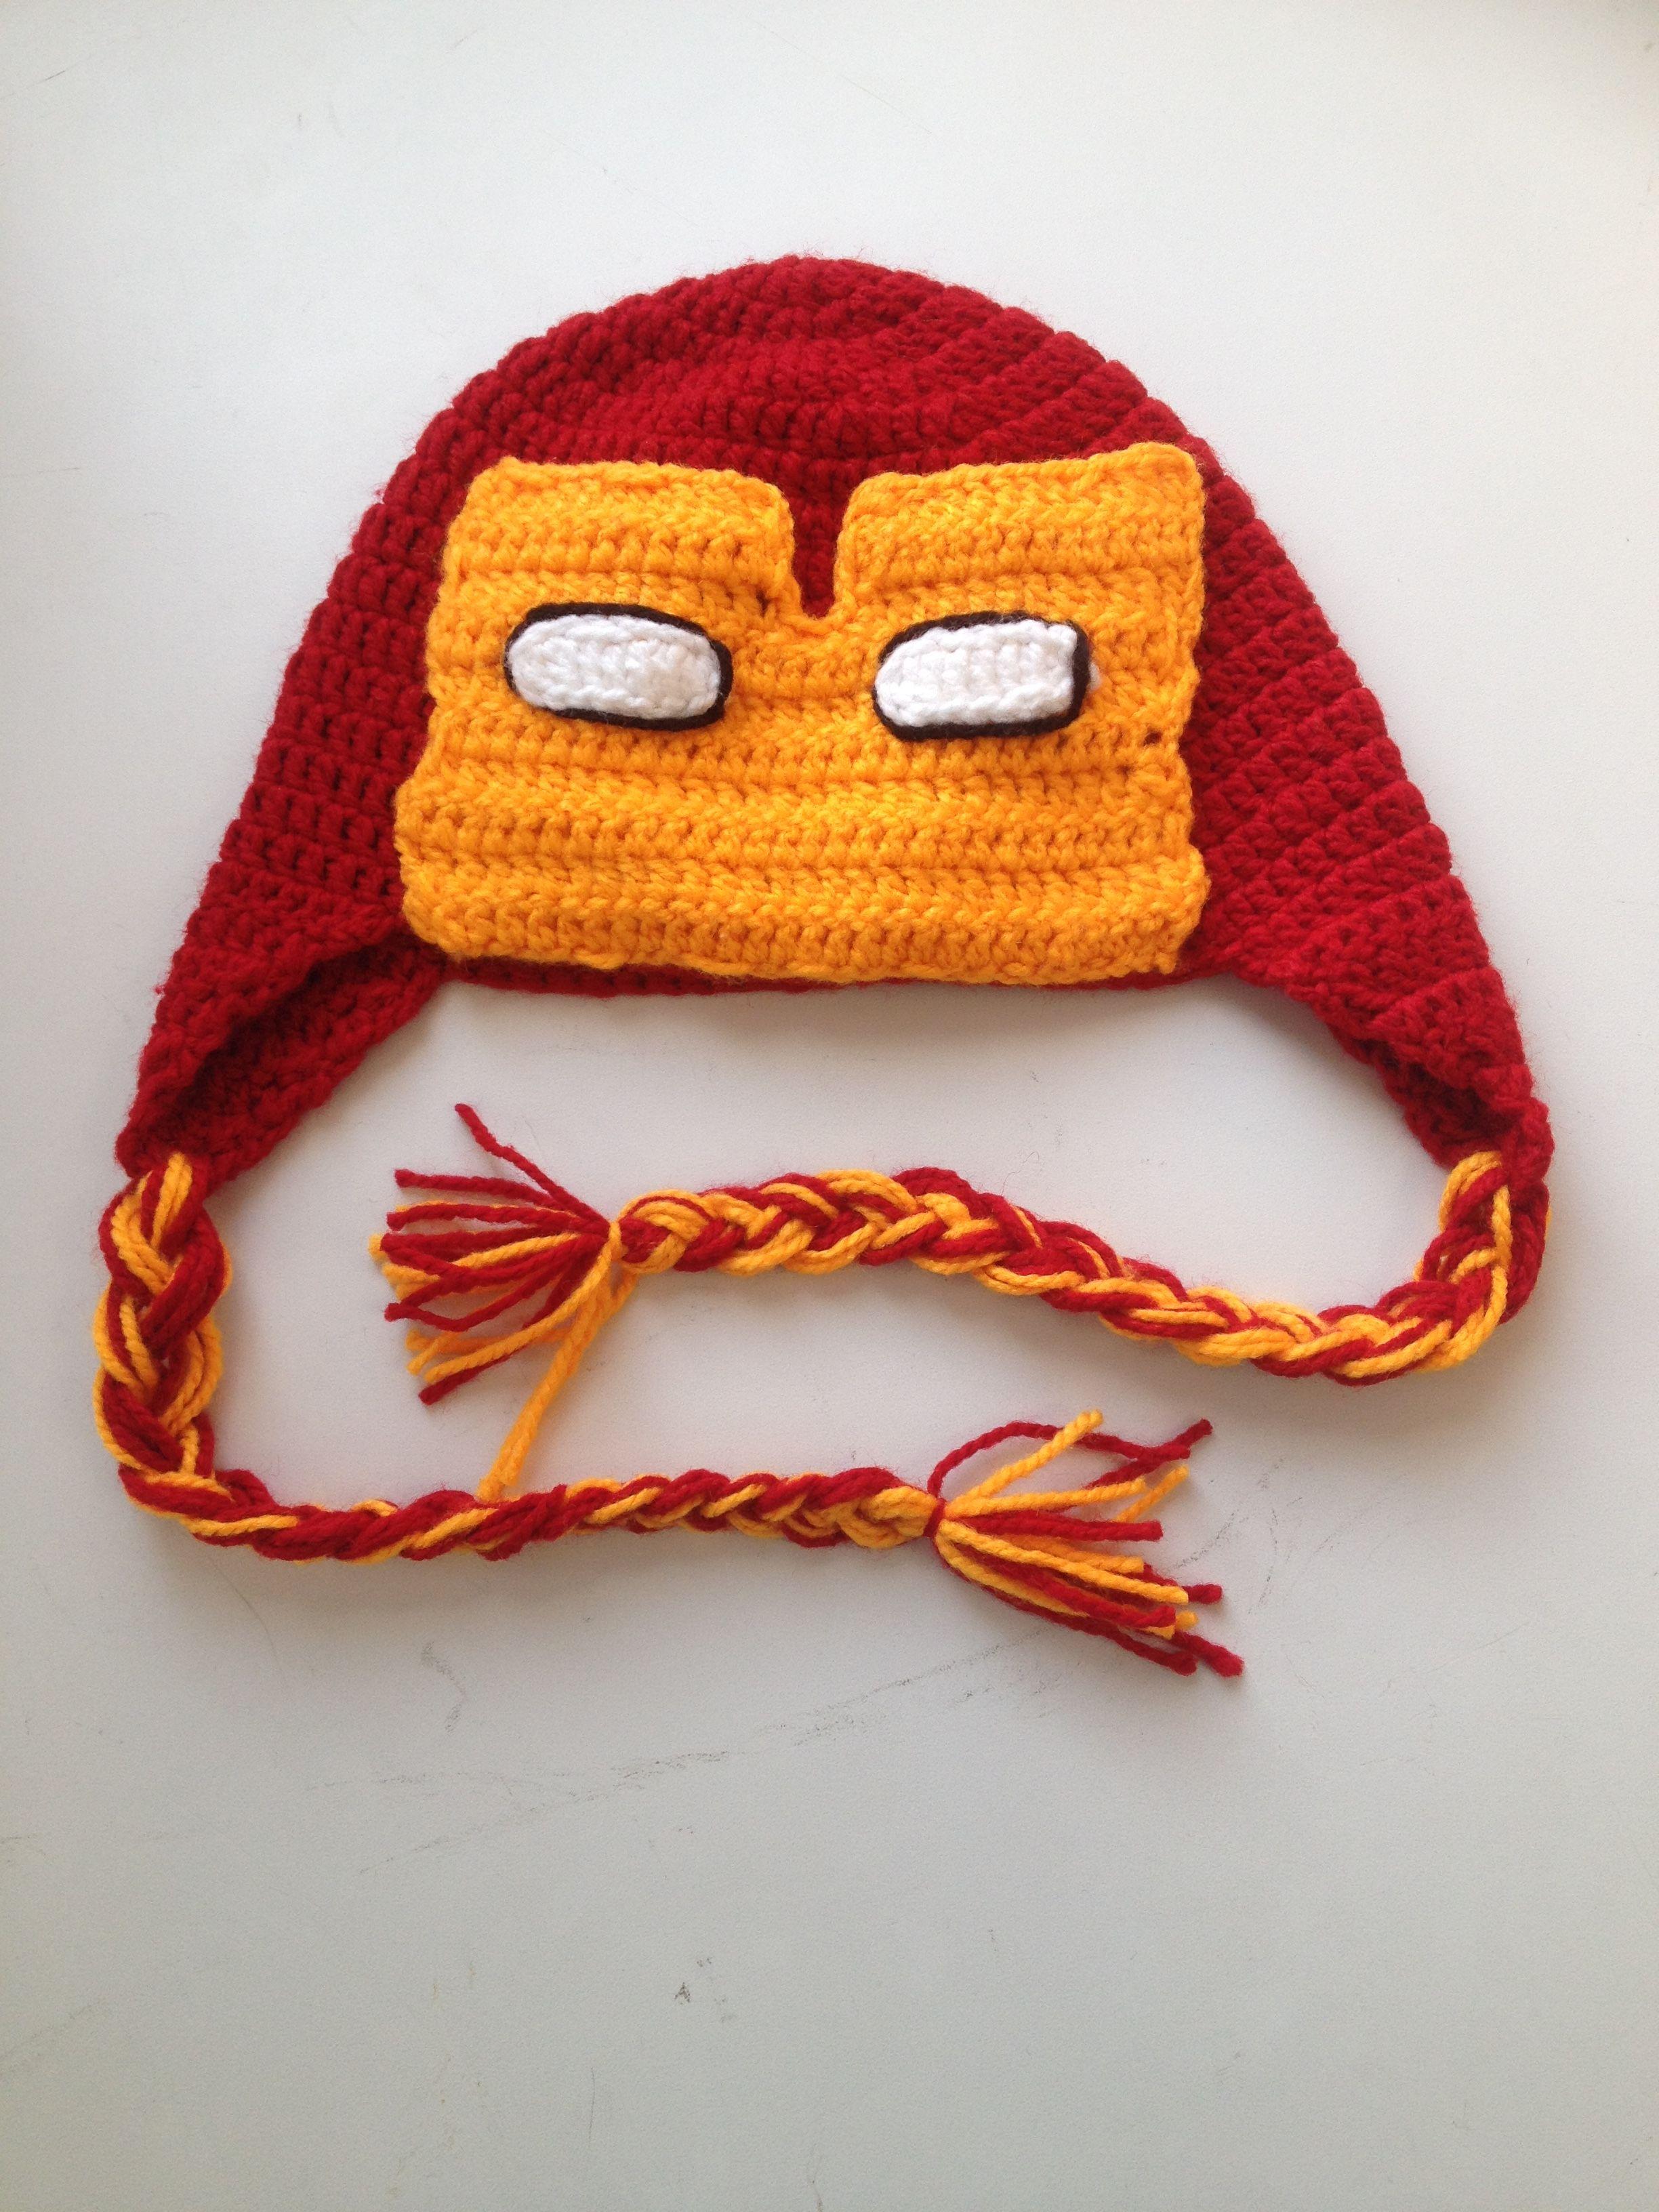 Gorro tejido Iron Man by Sahily Crochet $350